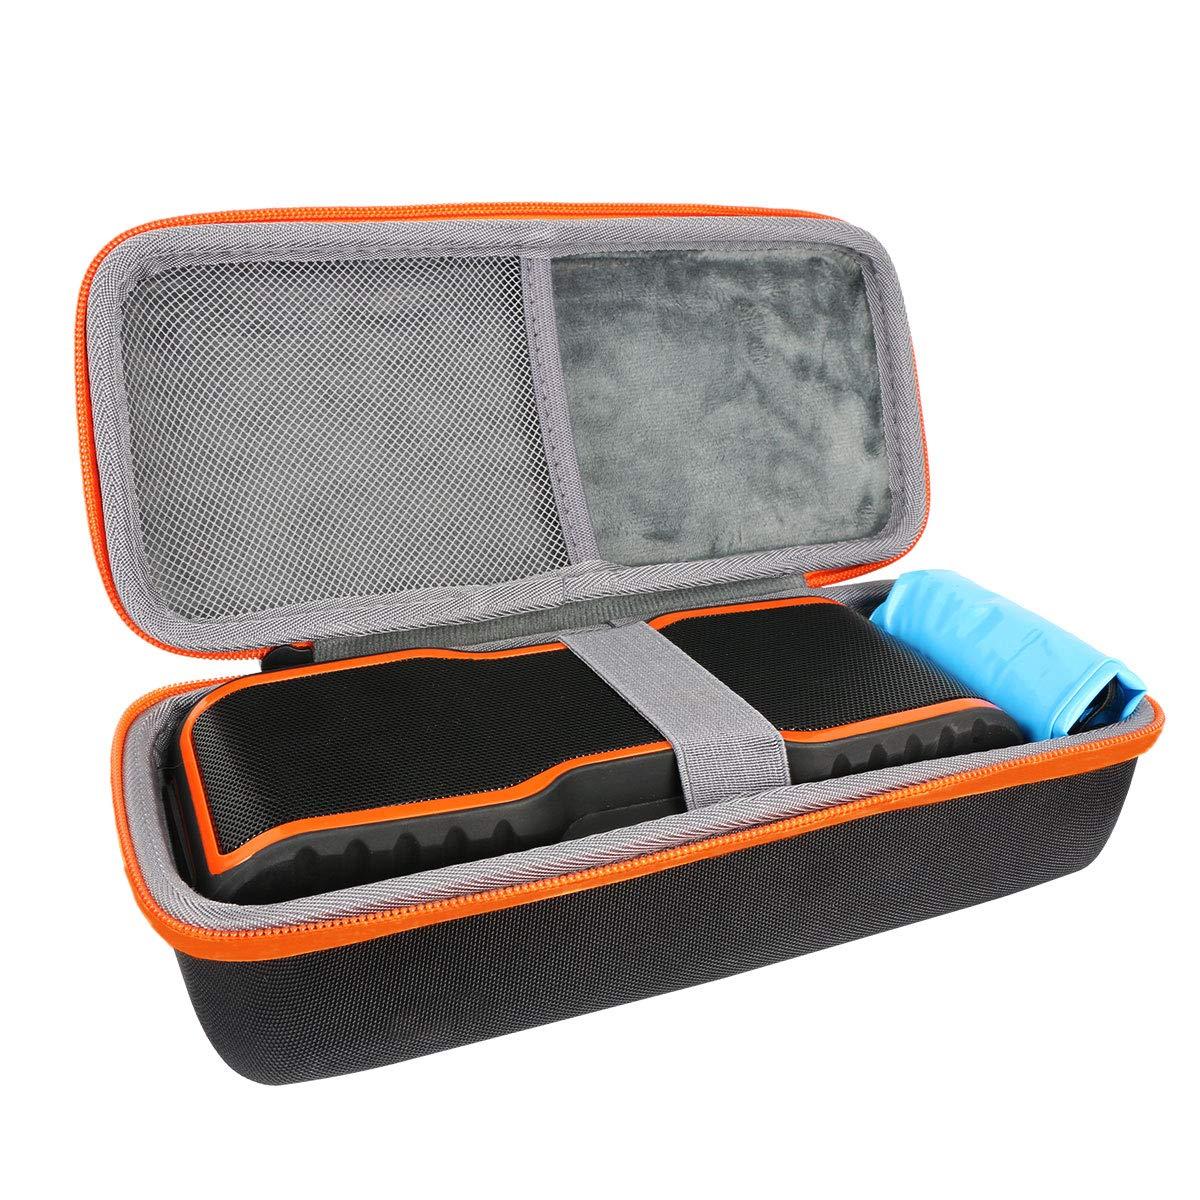 Hard Travel Case for AOMAIS Sport II II+ Portable Wireless Bluetooth Speakers by co2CREA (oranger)